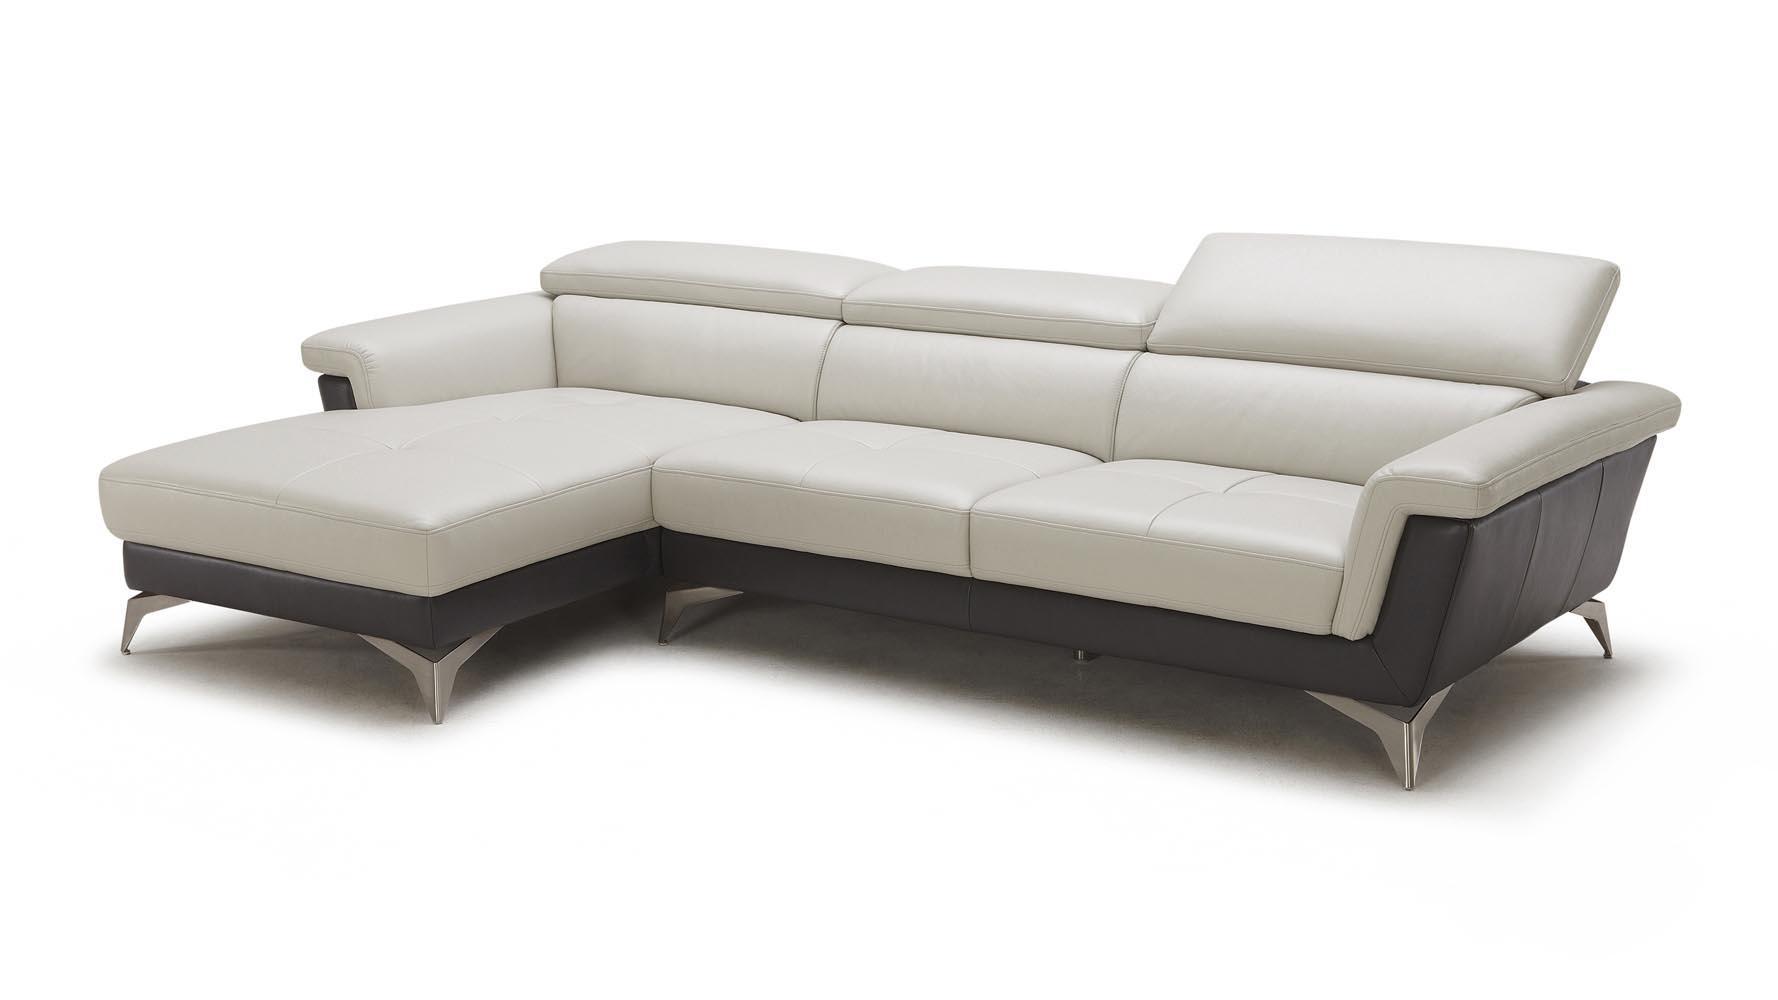 Gray/black Savoy 3 Seater Sectional Sofa | Zuri Furniture With Regard To Savoy Sofas (Image 3 of 20)